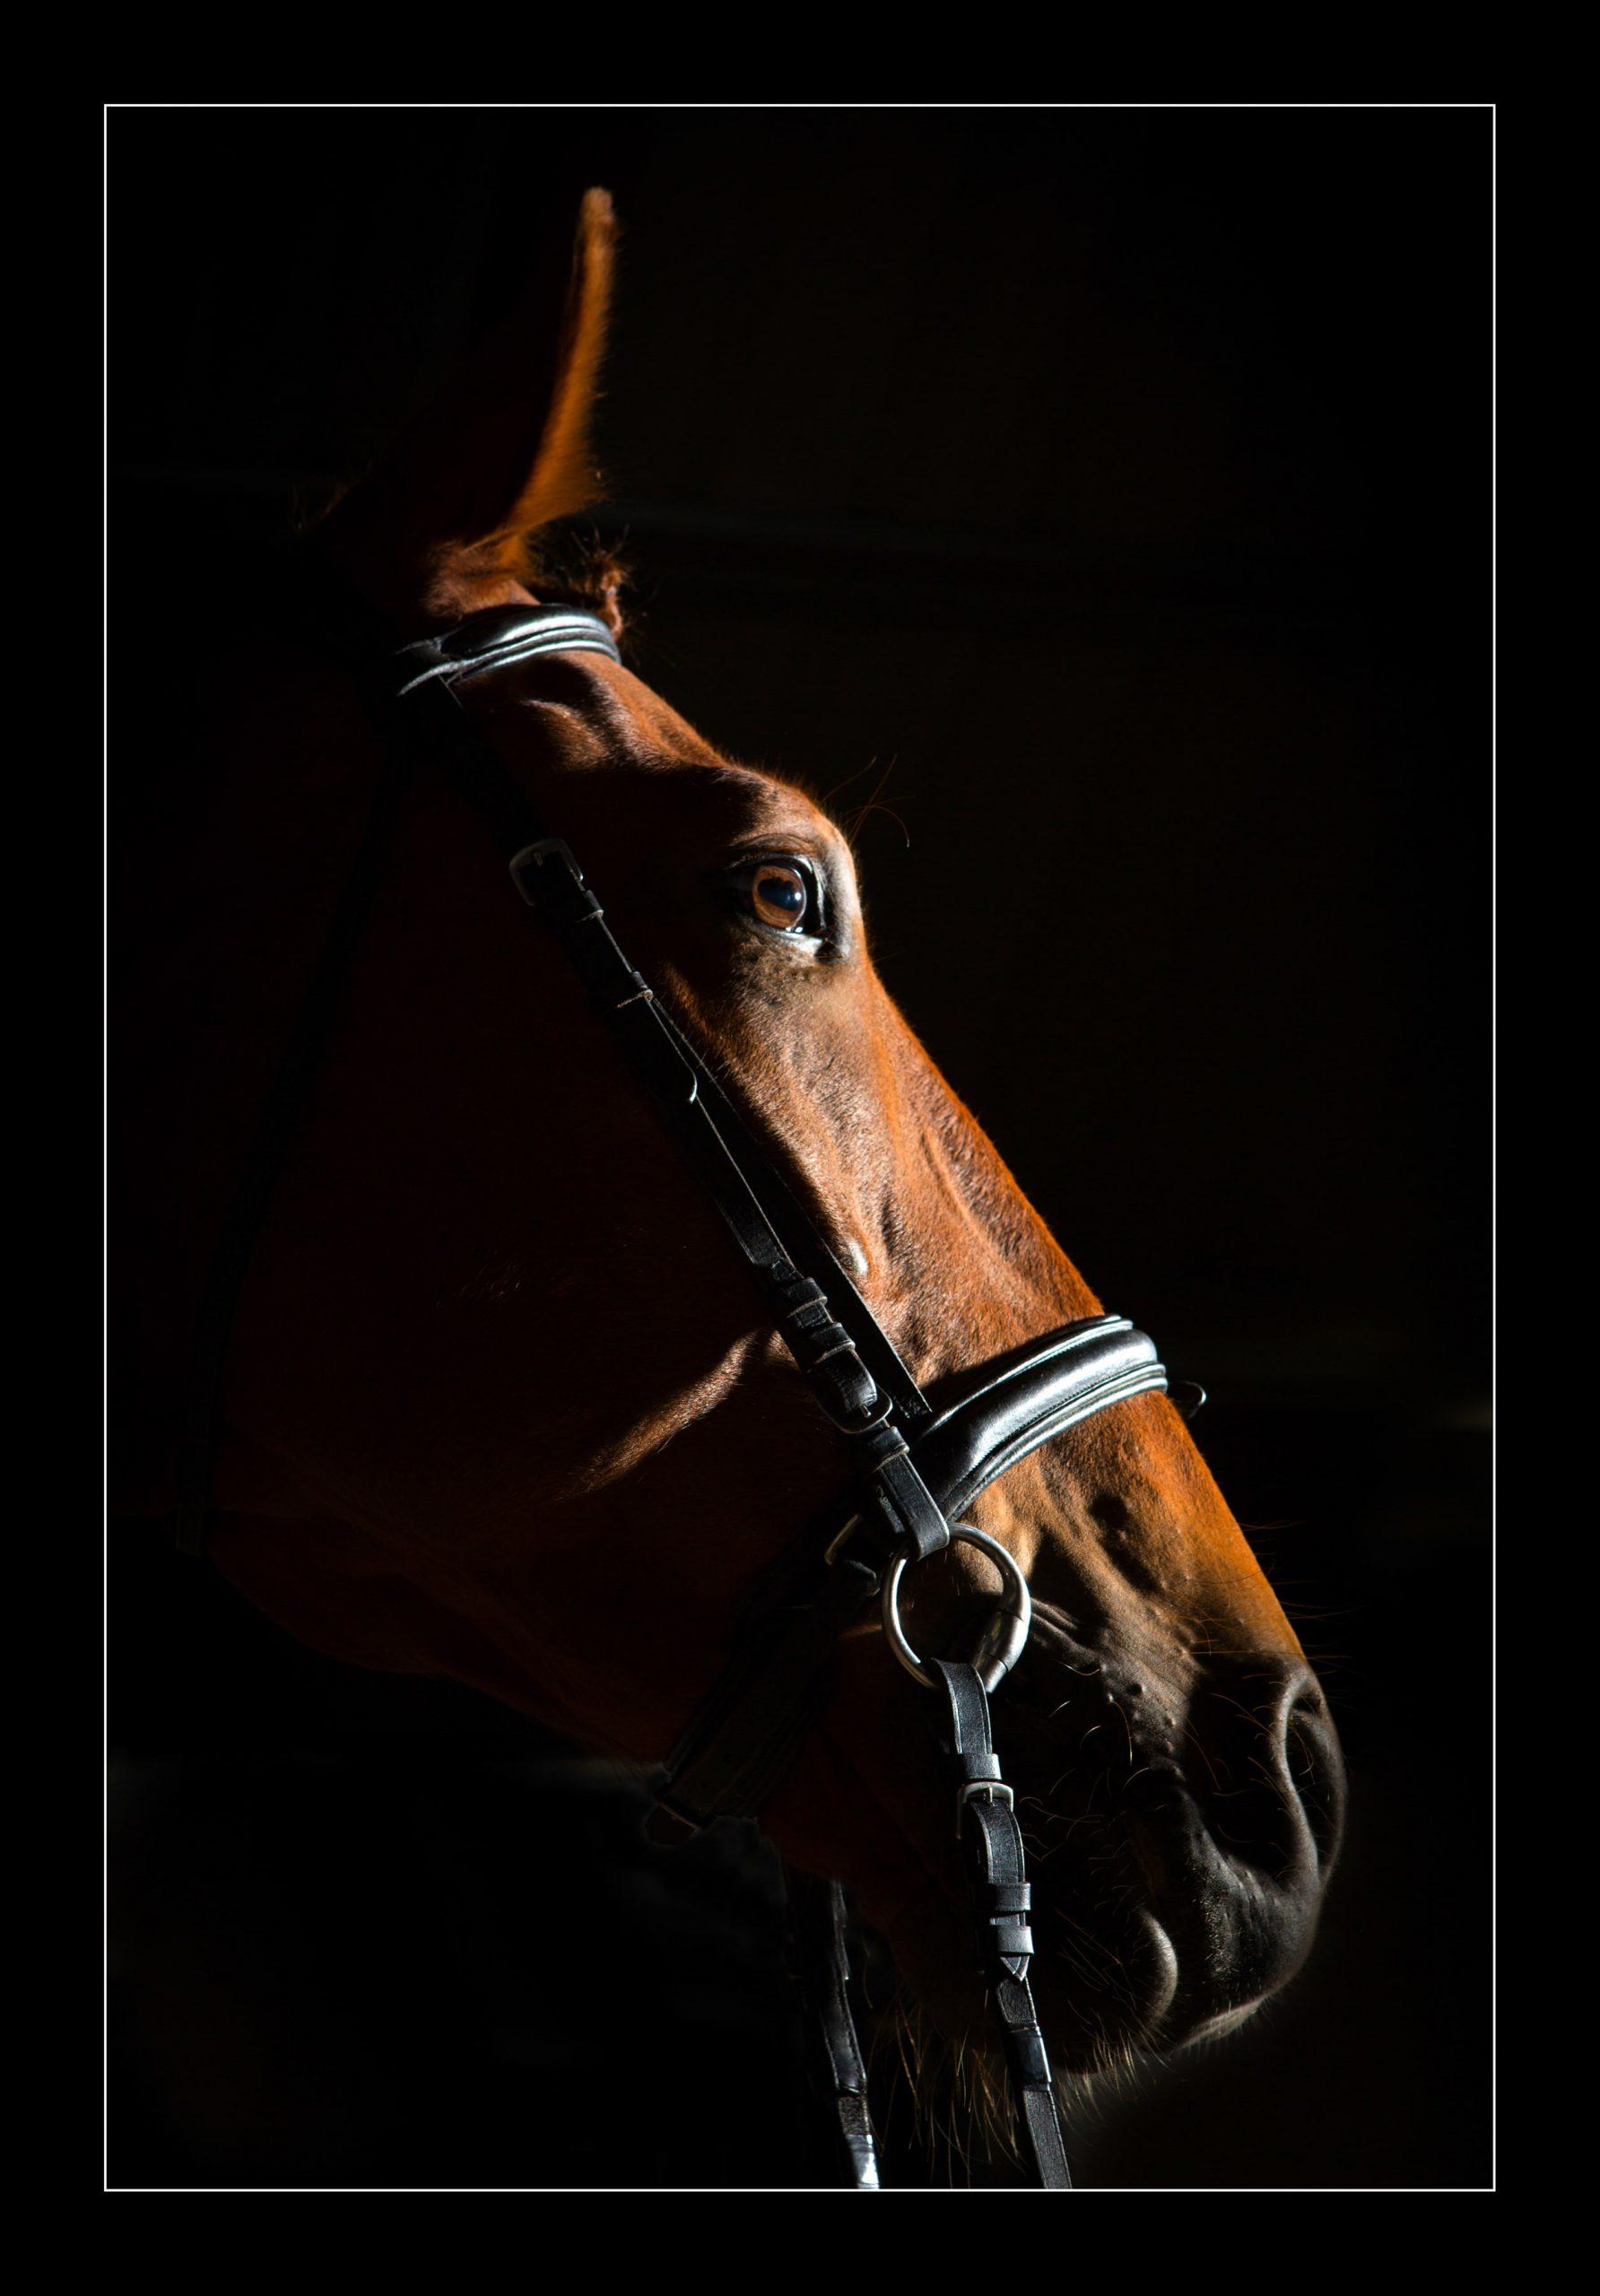 equine-6396 copy-min